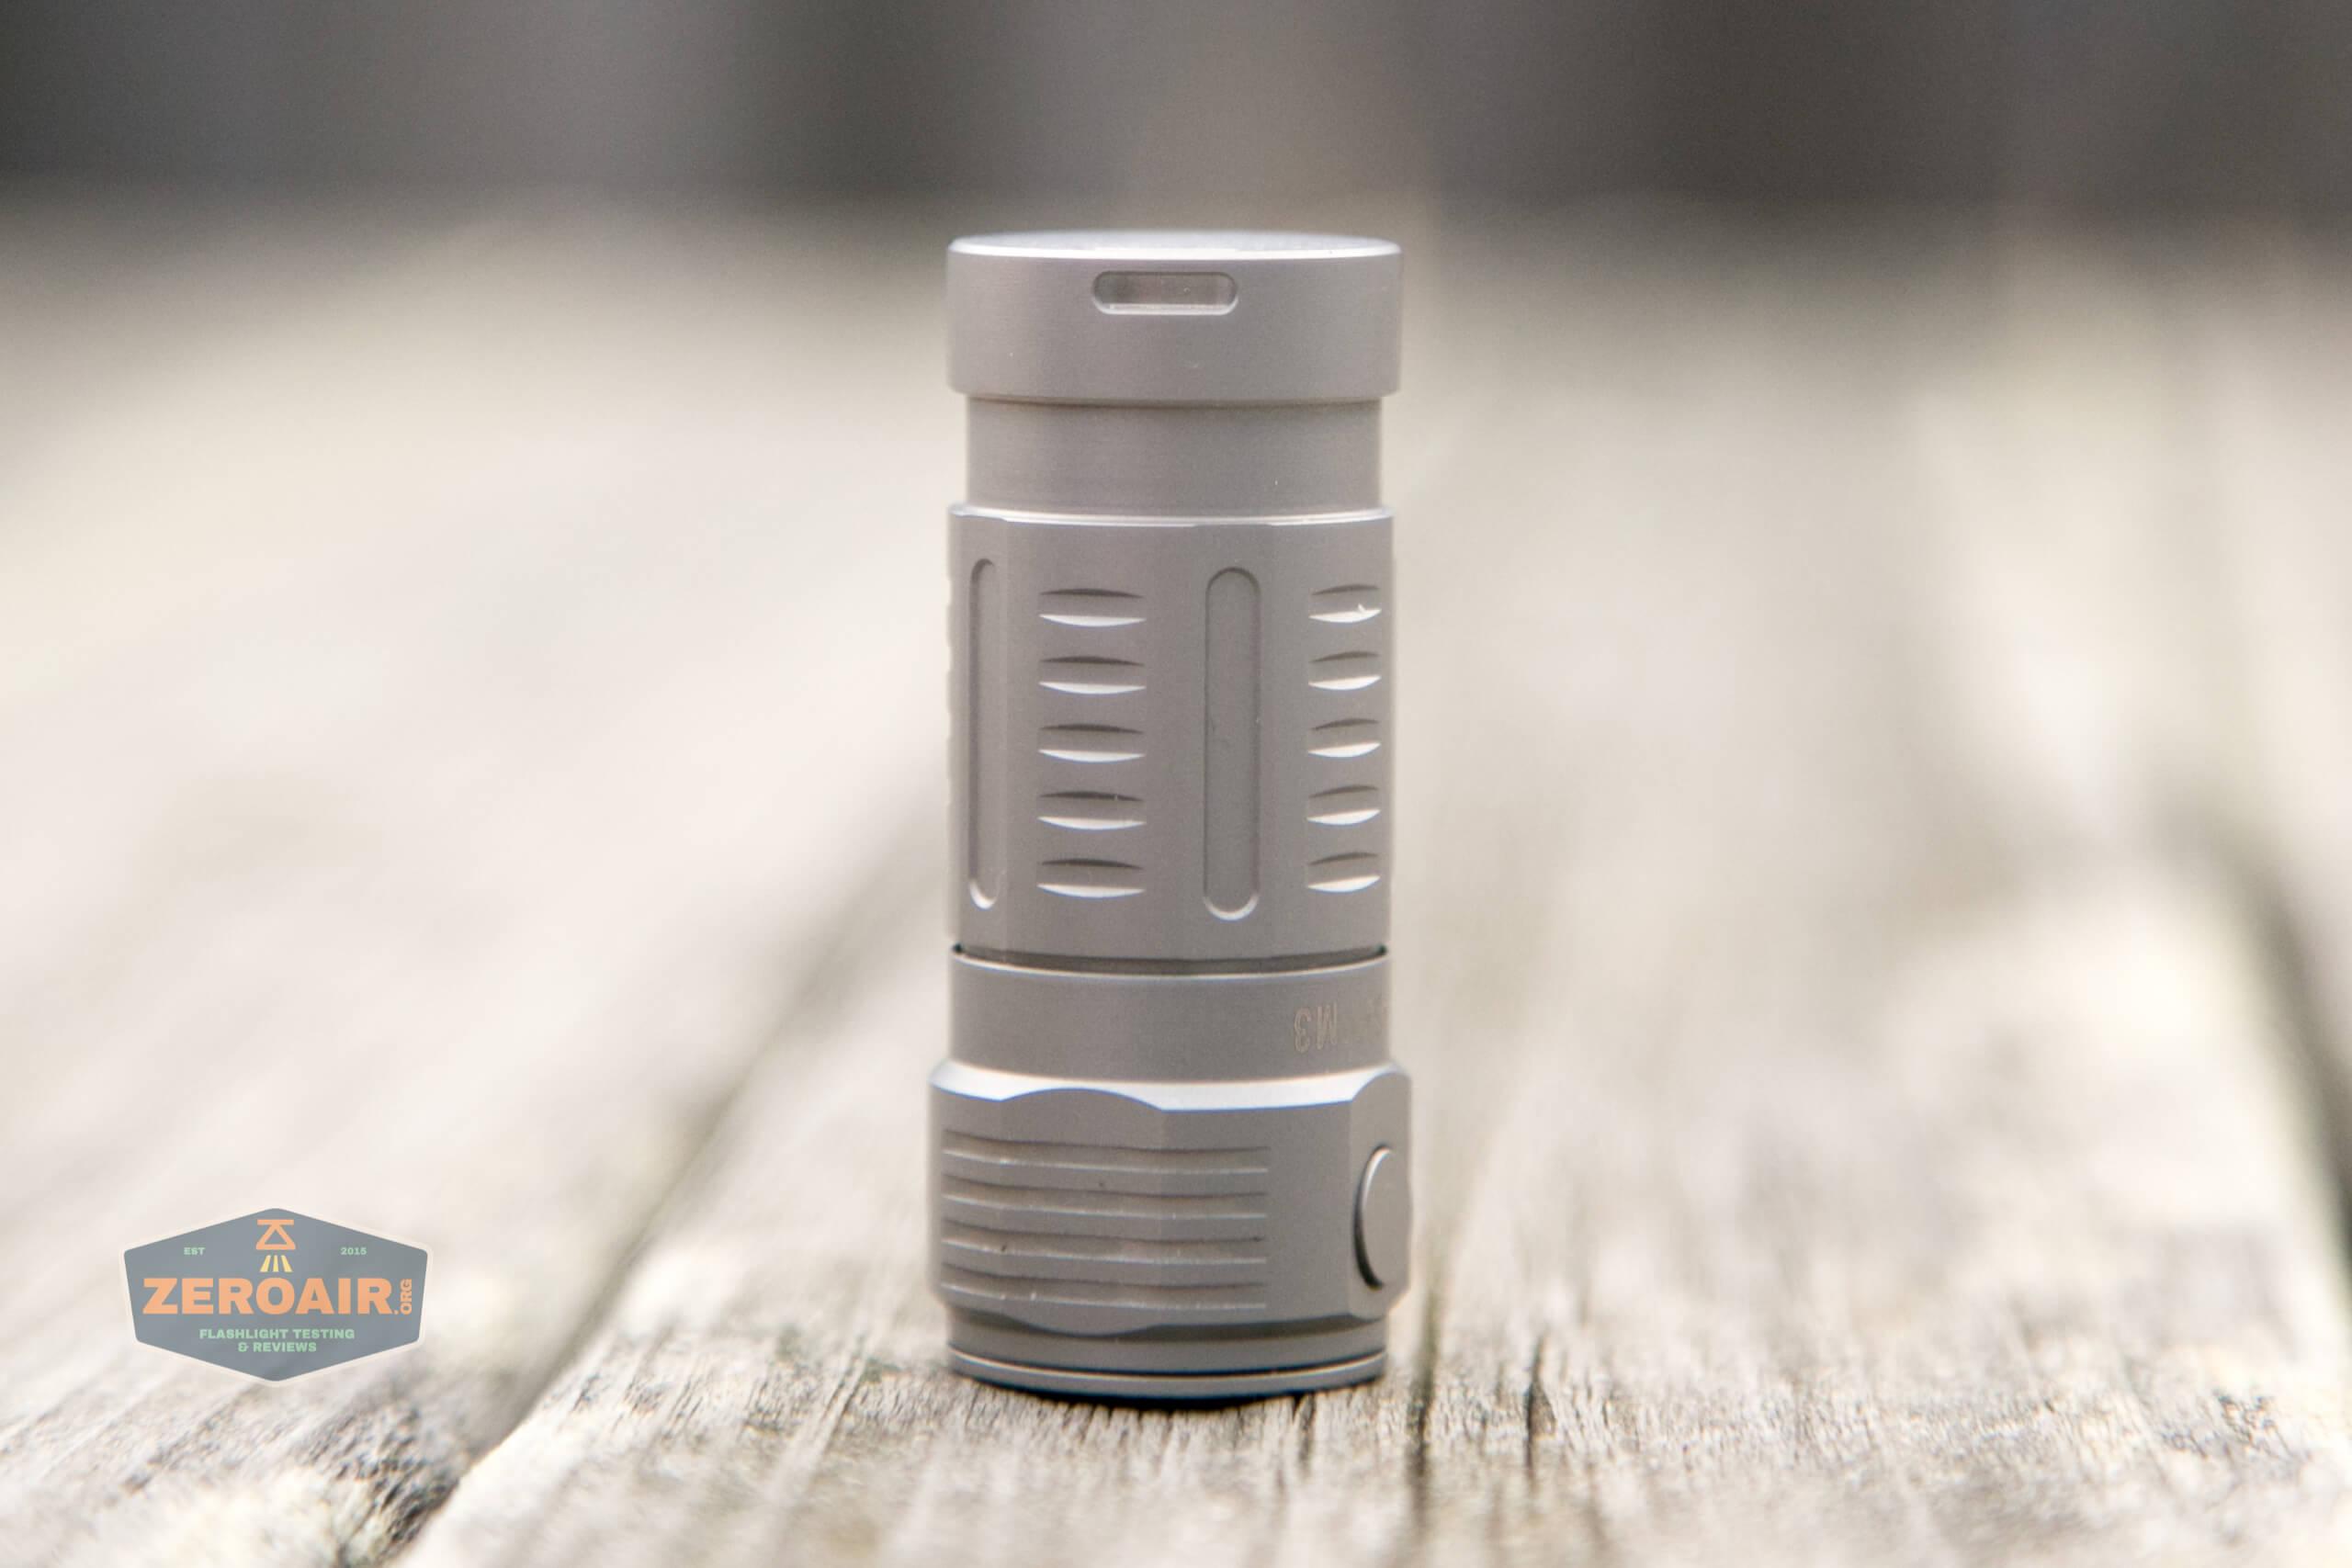 freasygears cyansky m3 titanium pocket flashlight headstanding